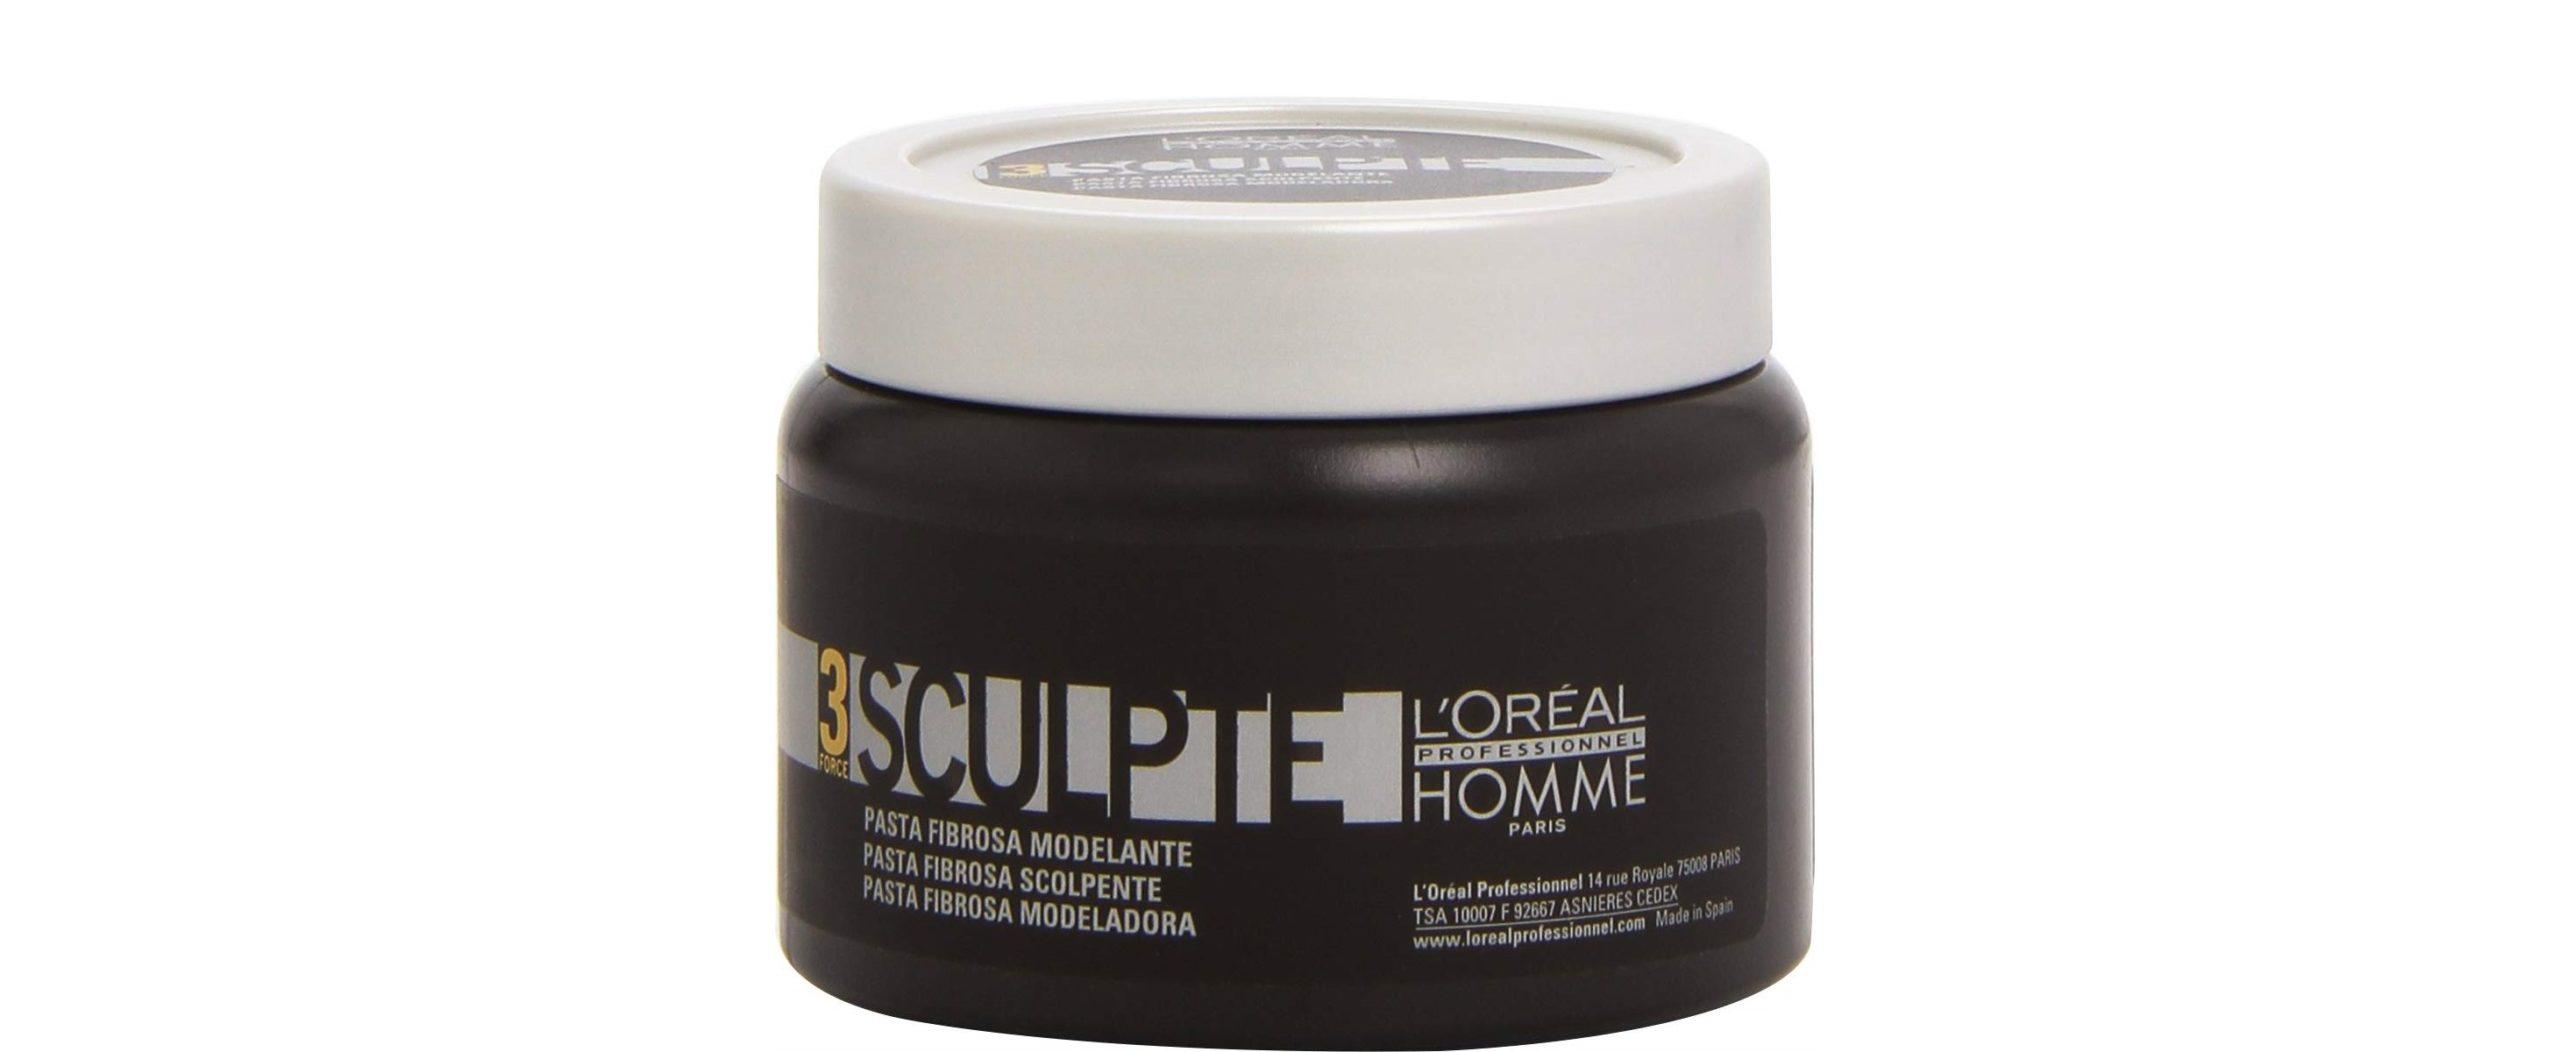 Cire coiffante L'Oréal Sculpte